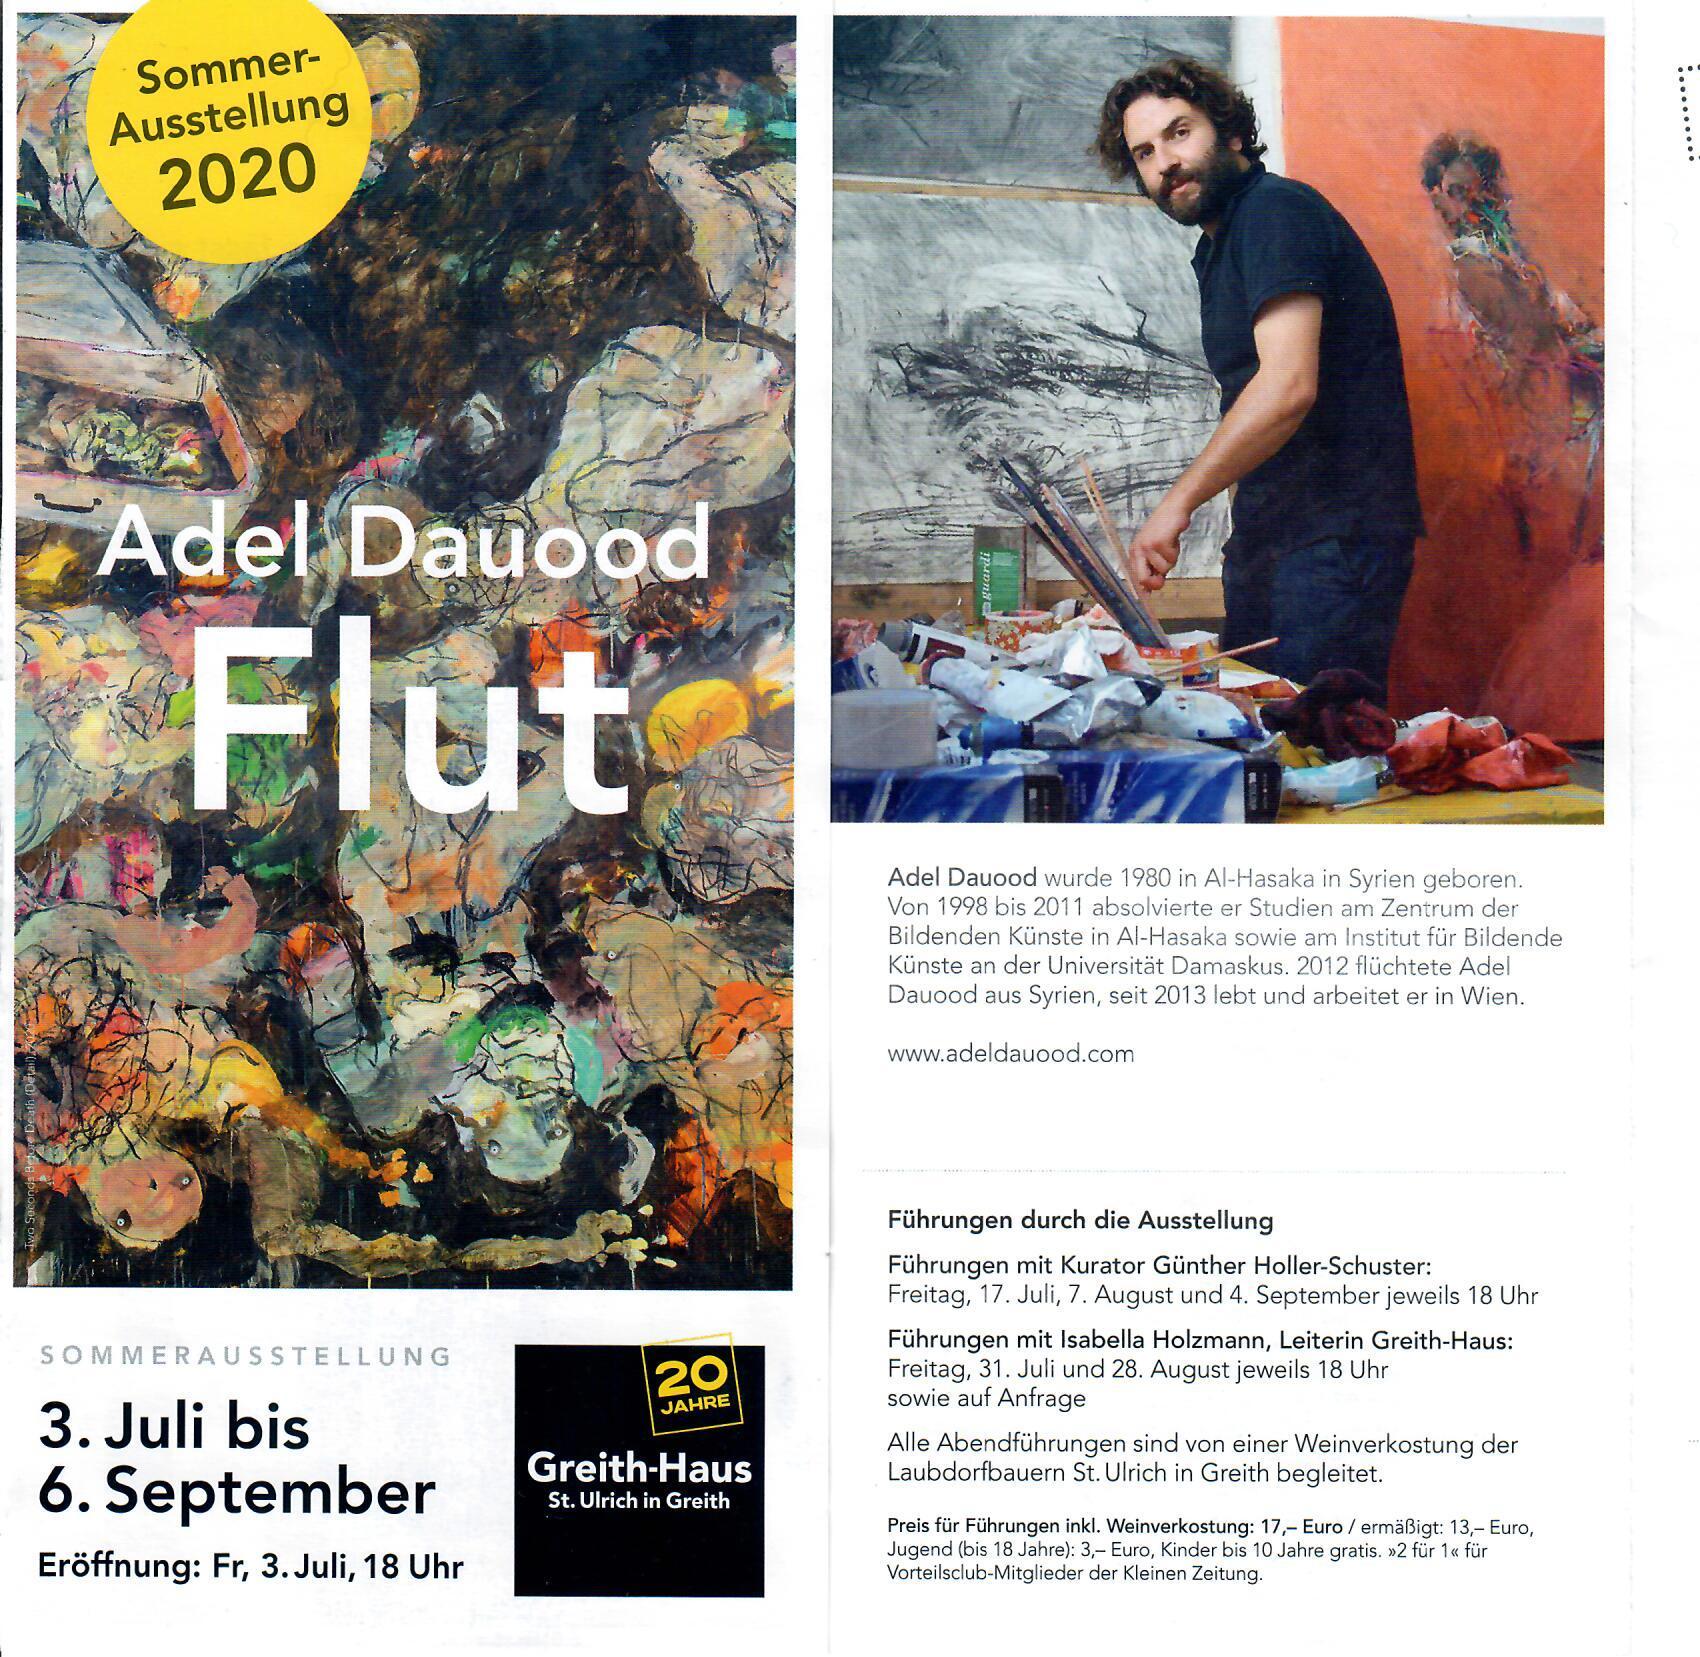 Adel Dauood Flut.jpg 2